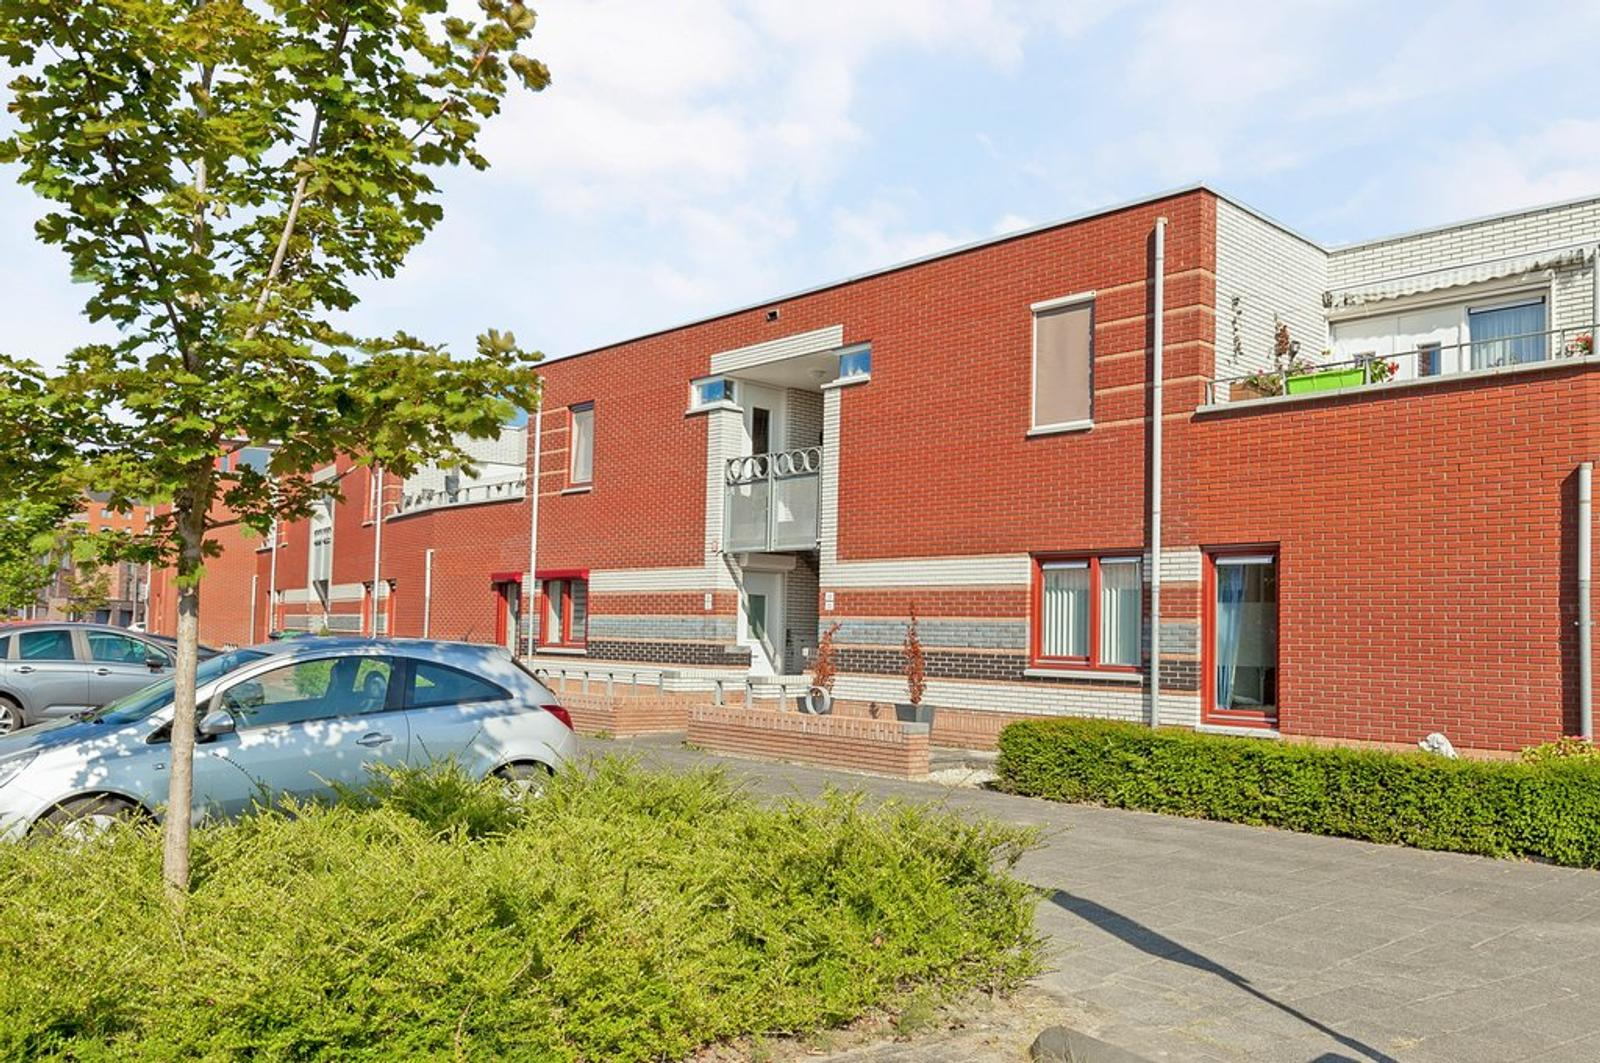 Roald Amundsenstraat 50